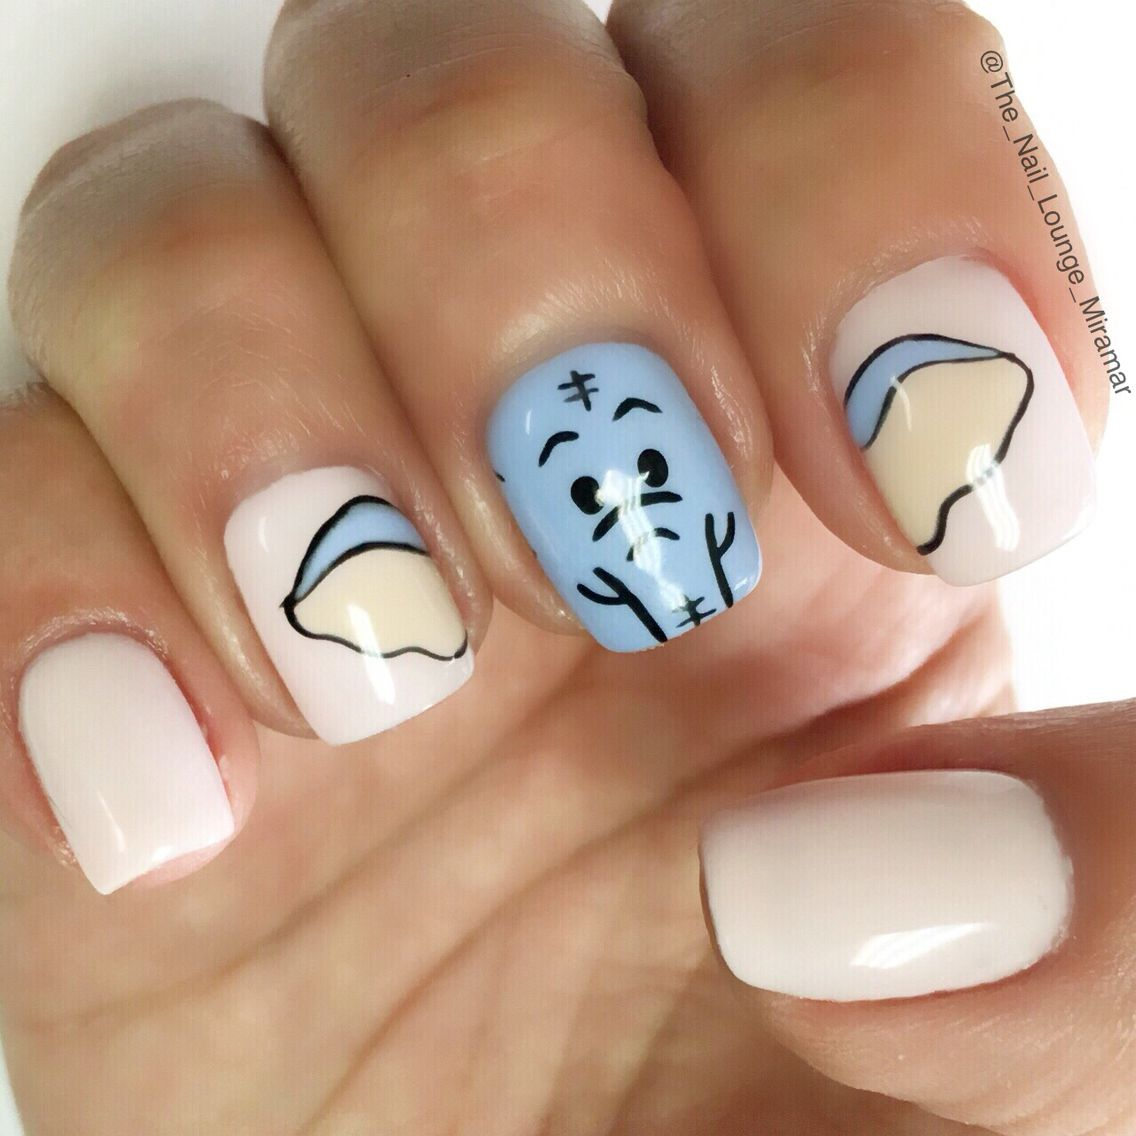 Cute Nail Art: Cute Baby Shower Elephant Nail Art Design